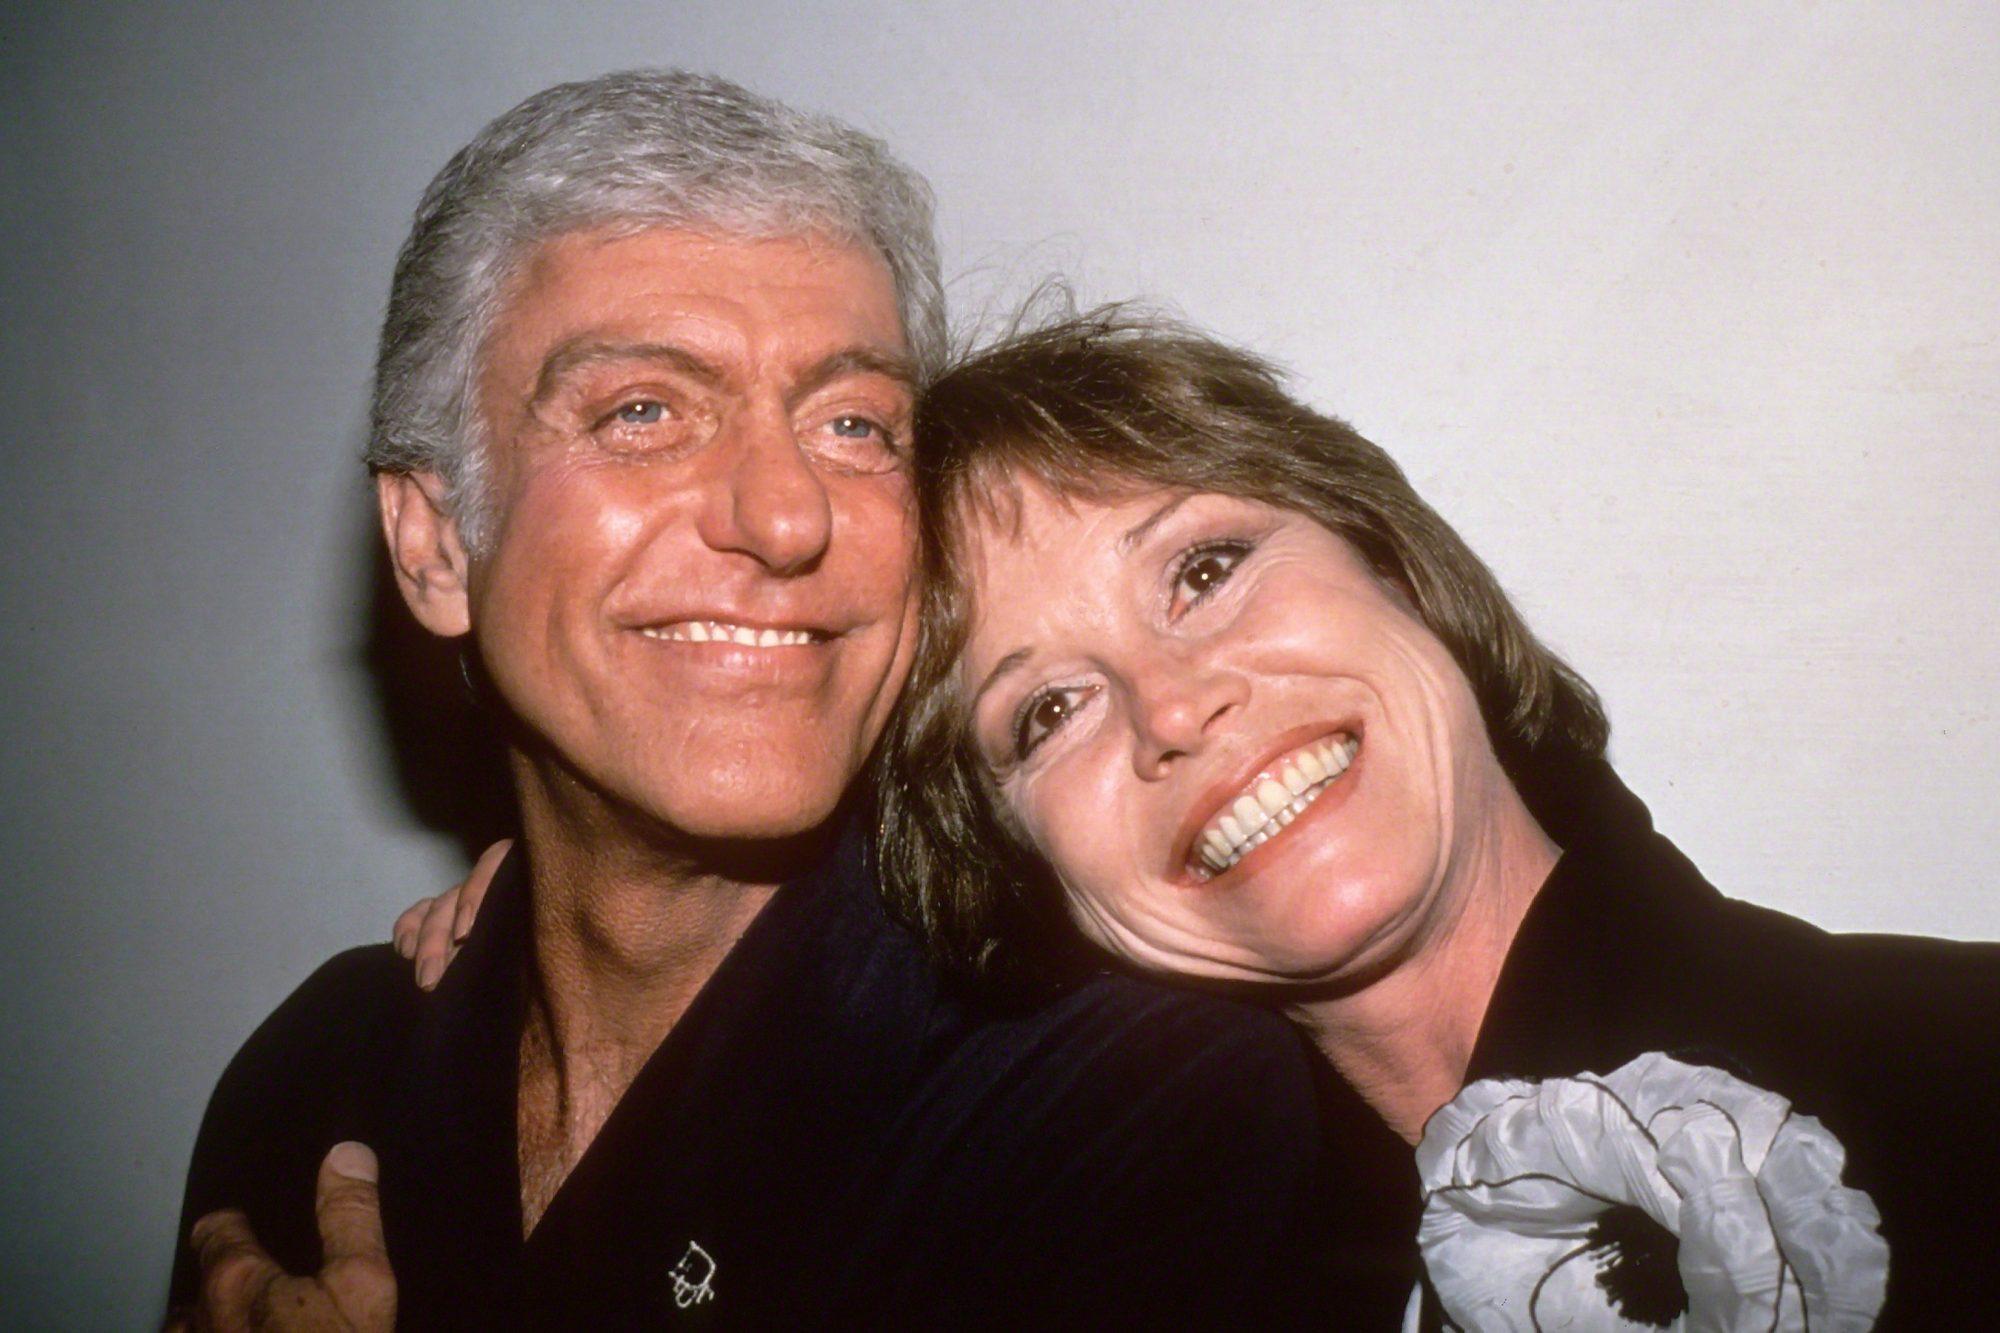 Dick Van Dyke and Mary Tyler Moore